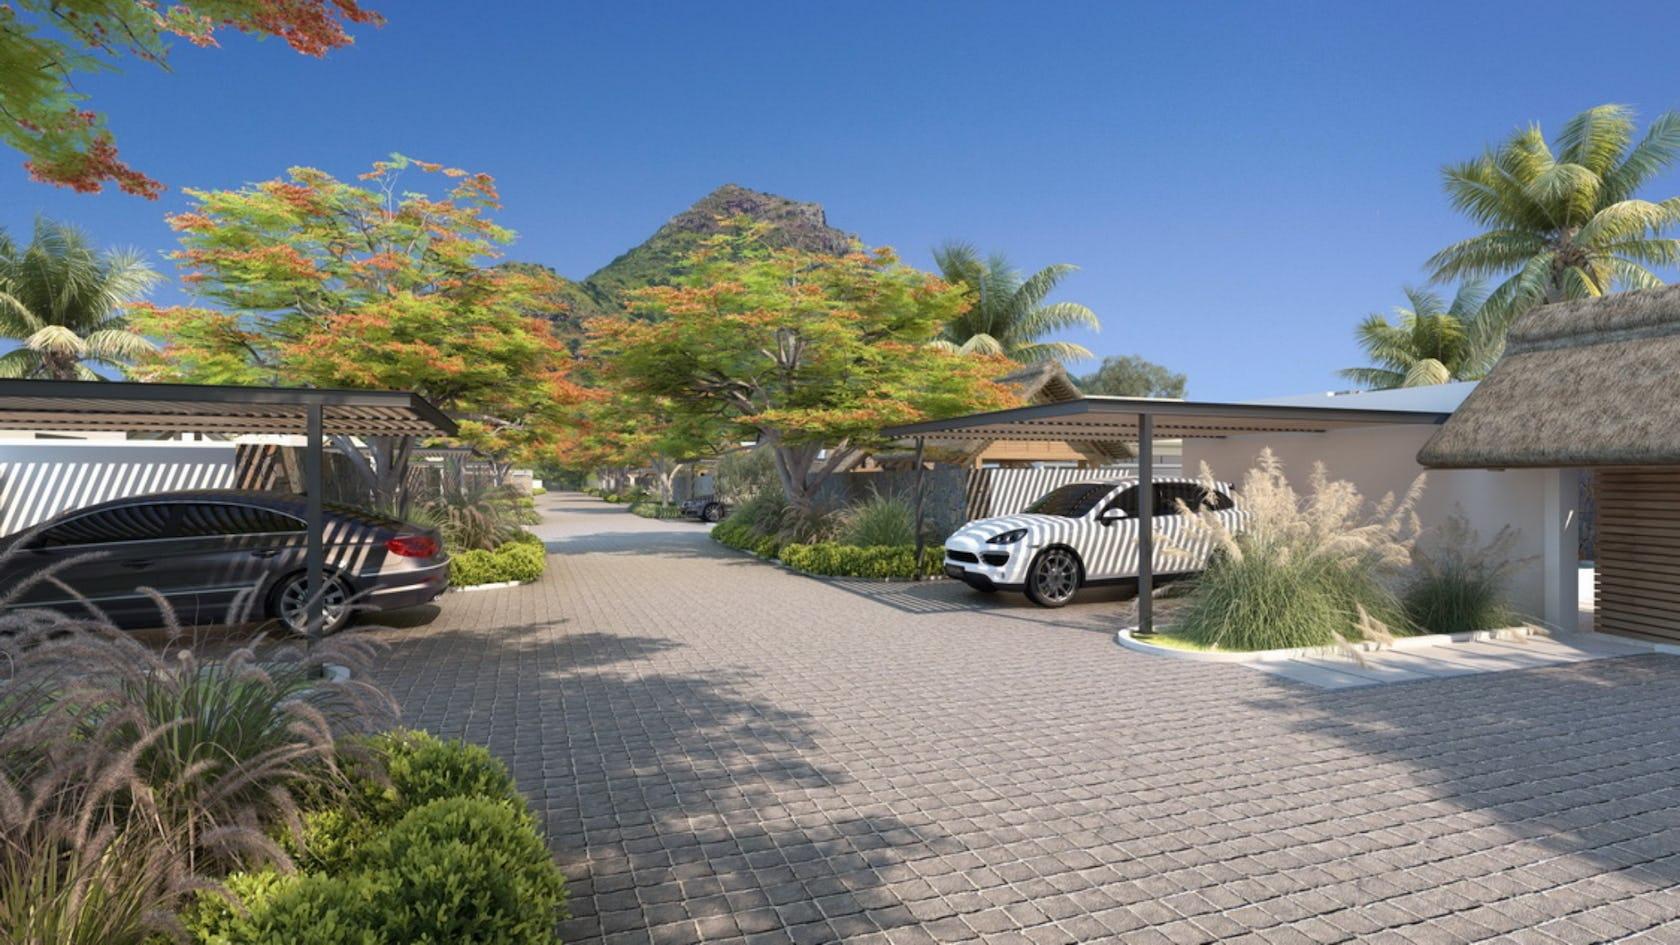 car walkway path outdoors tree plant wheel flagstone garden slate